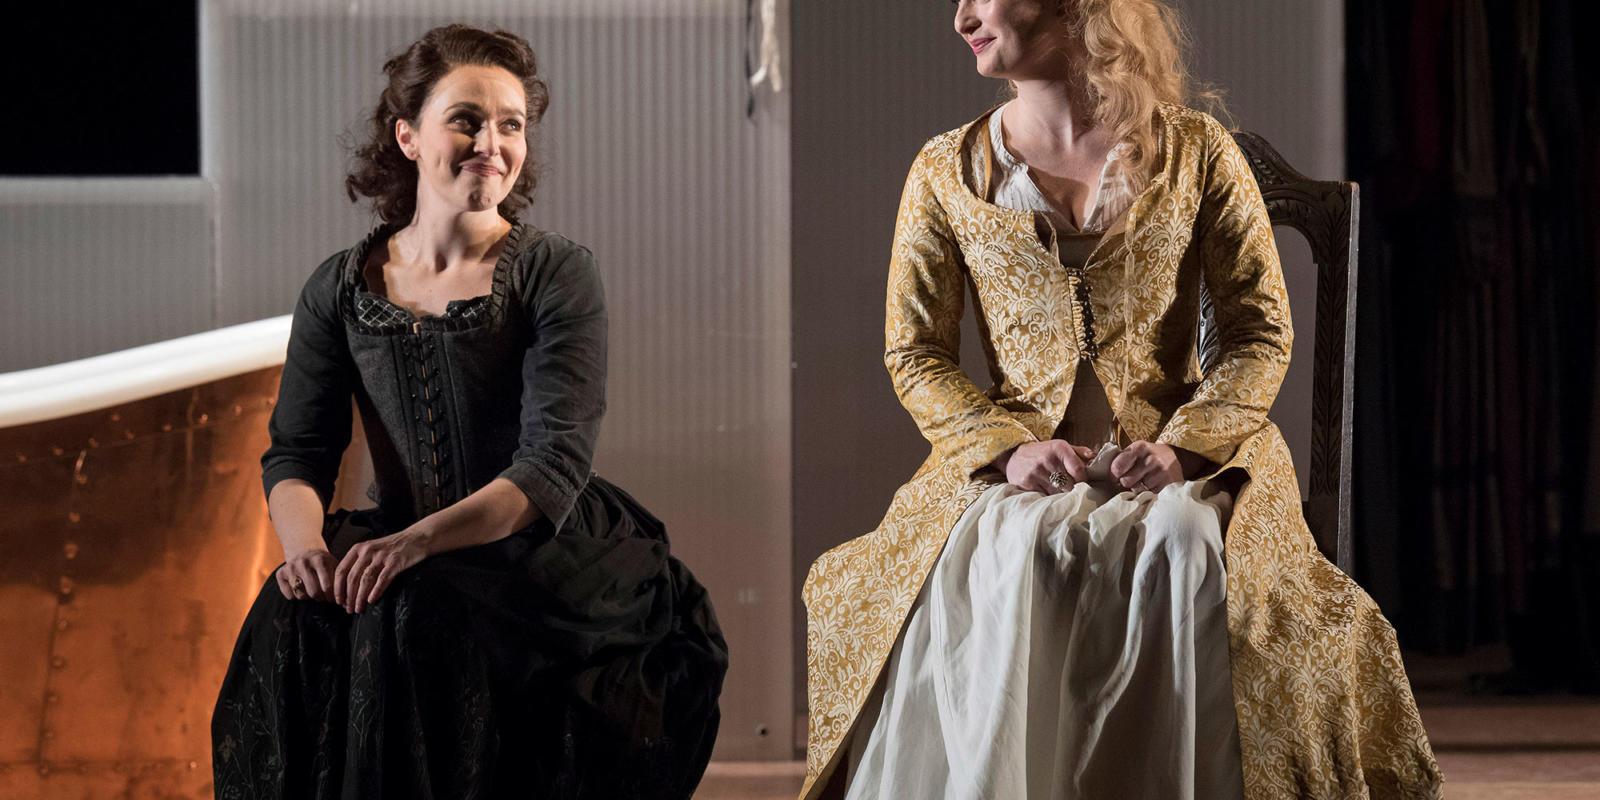 ENO 17/18: The Marriage of Figaro Rhian Lois Lucy Crowe (c) Alastair Muir